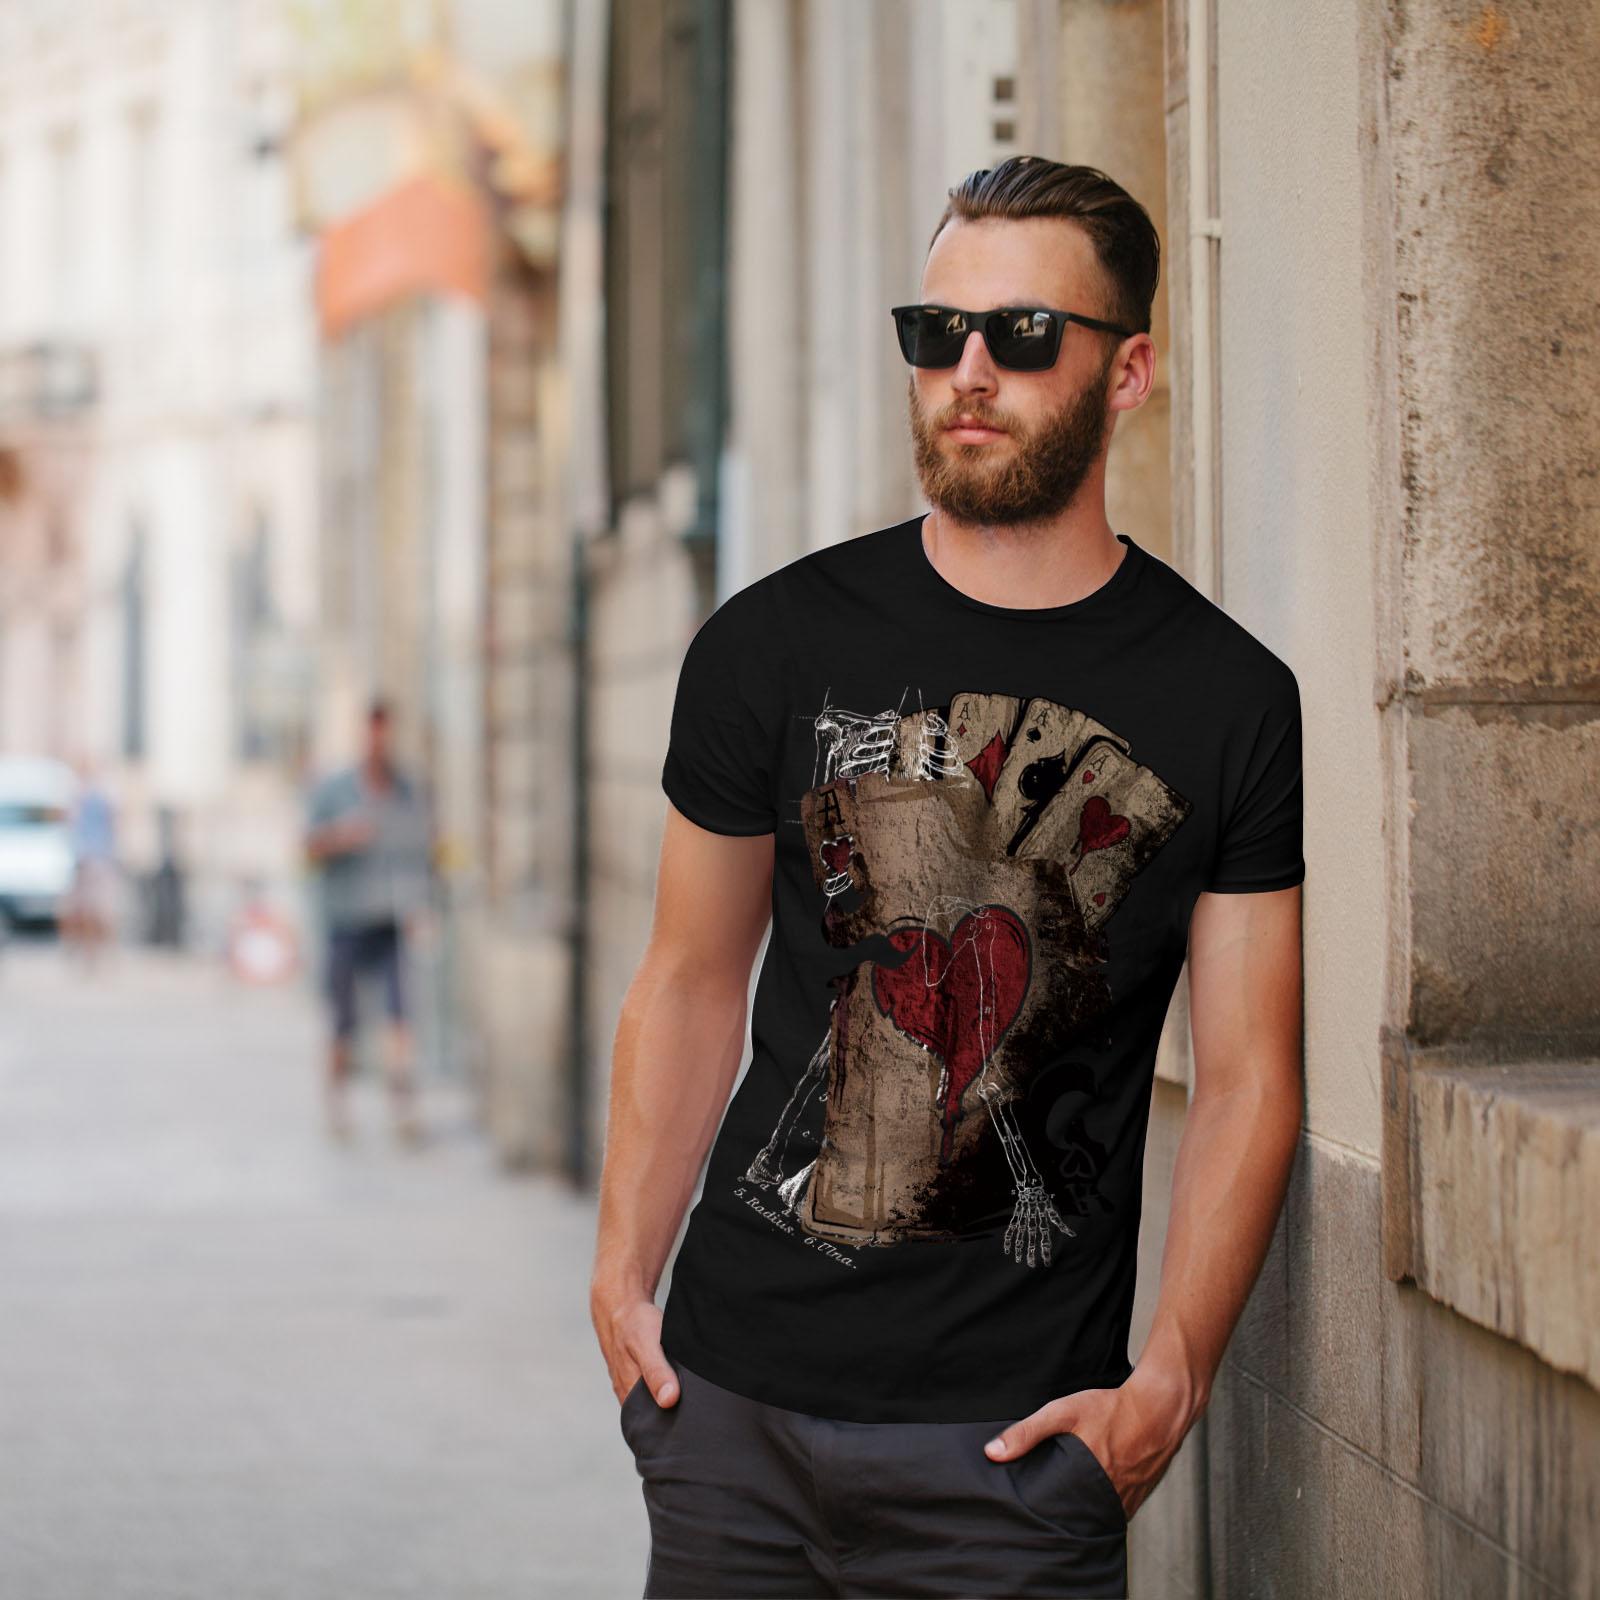 Wellcoda-Poker-Gamble-Squelette-T-shirt-homme-effrayant-conception-graphique-imprime-Tee miniature 5